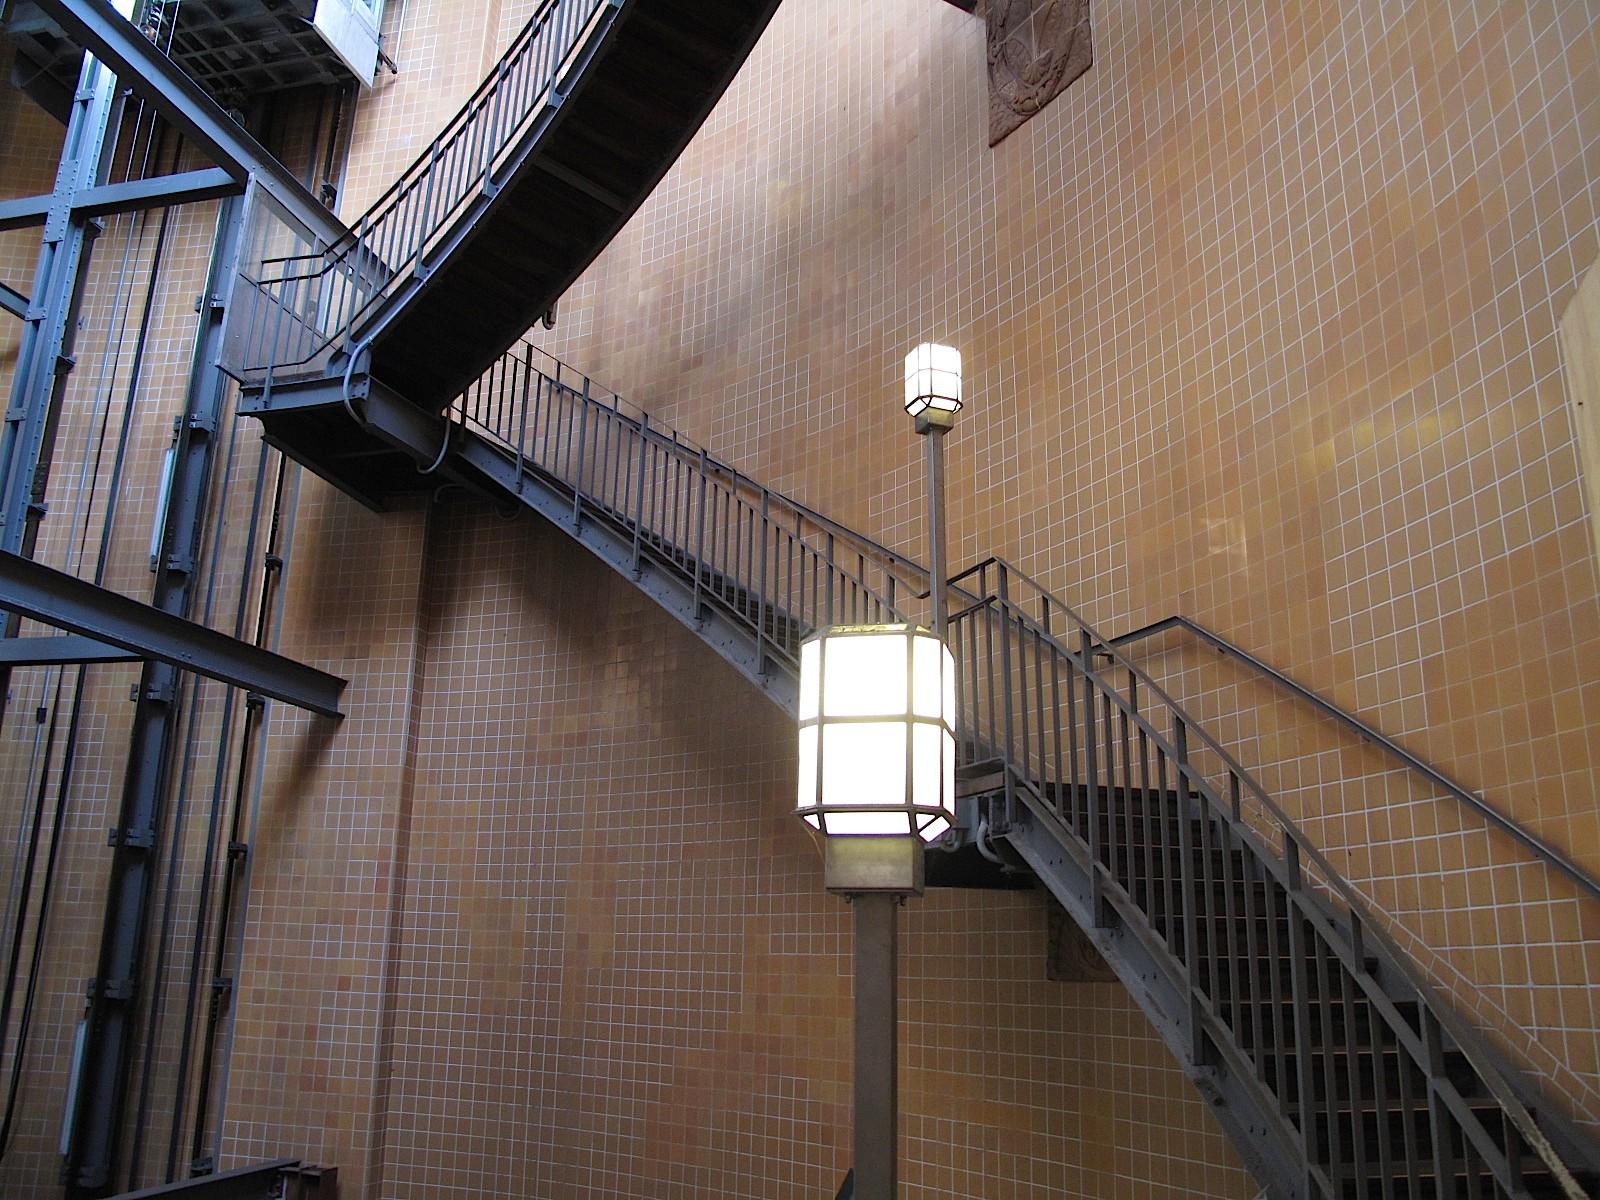 Treppenhaus Alter Elbtunnel